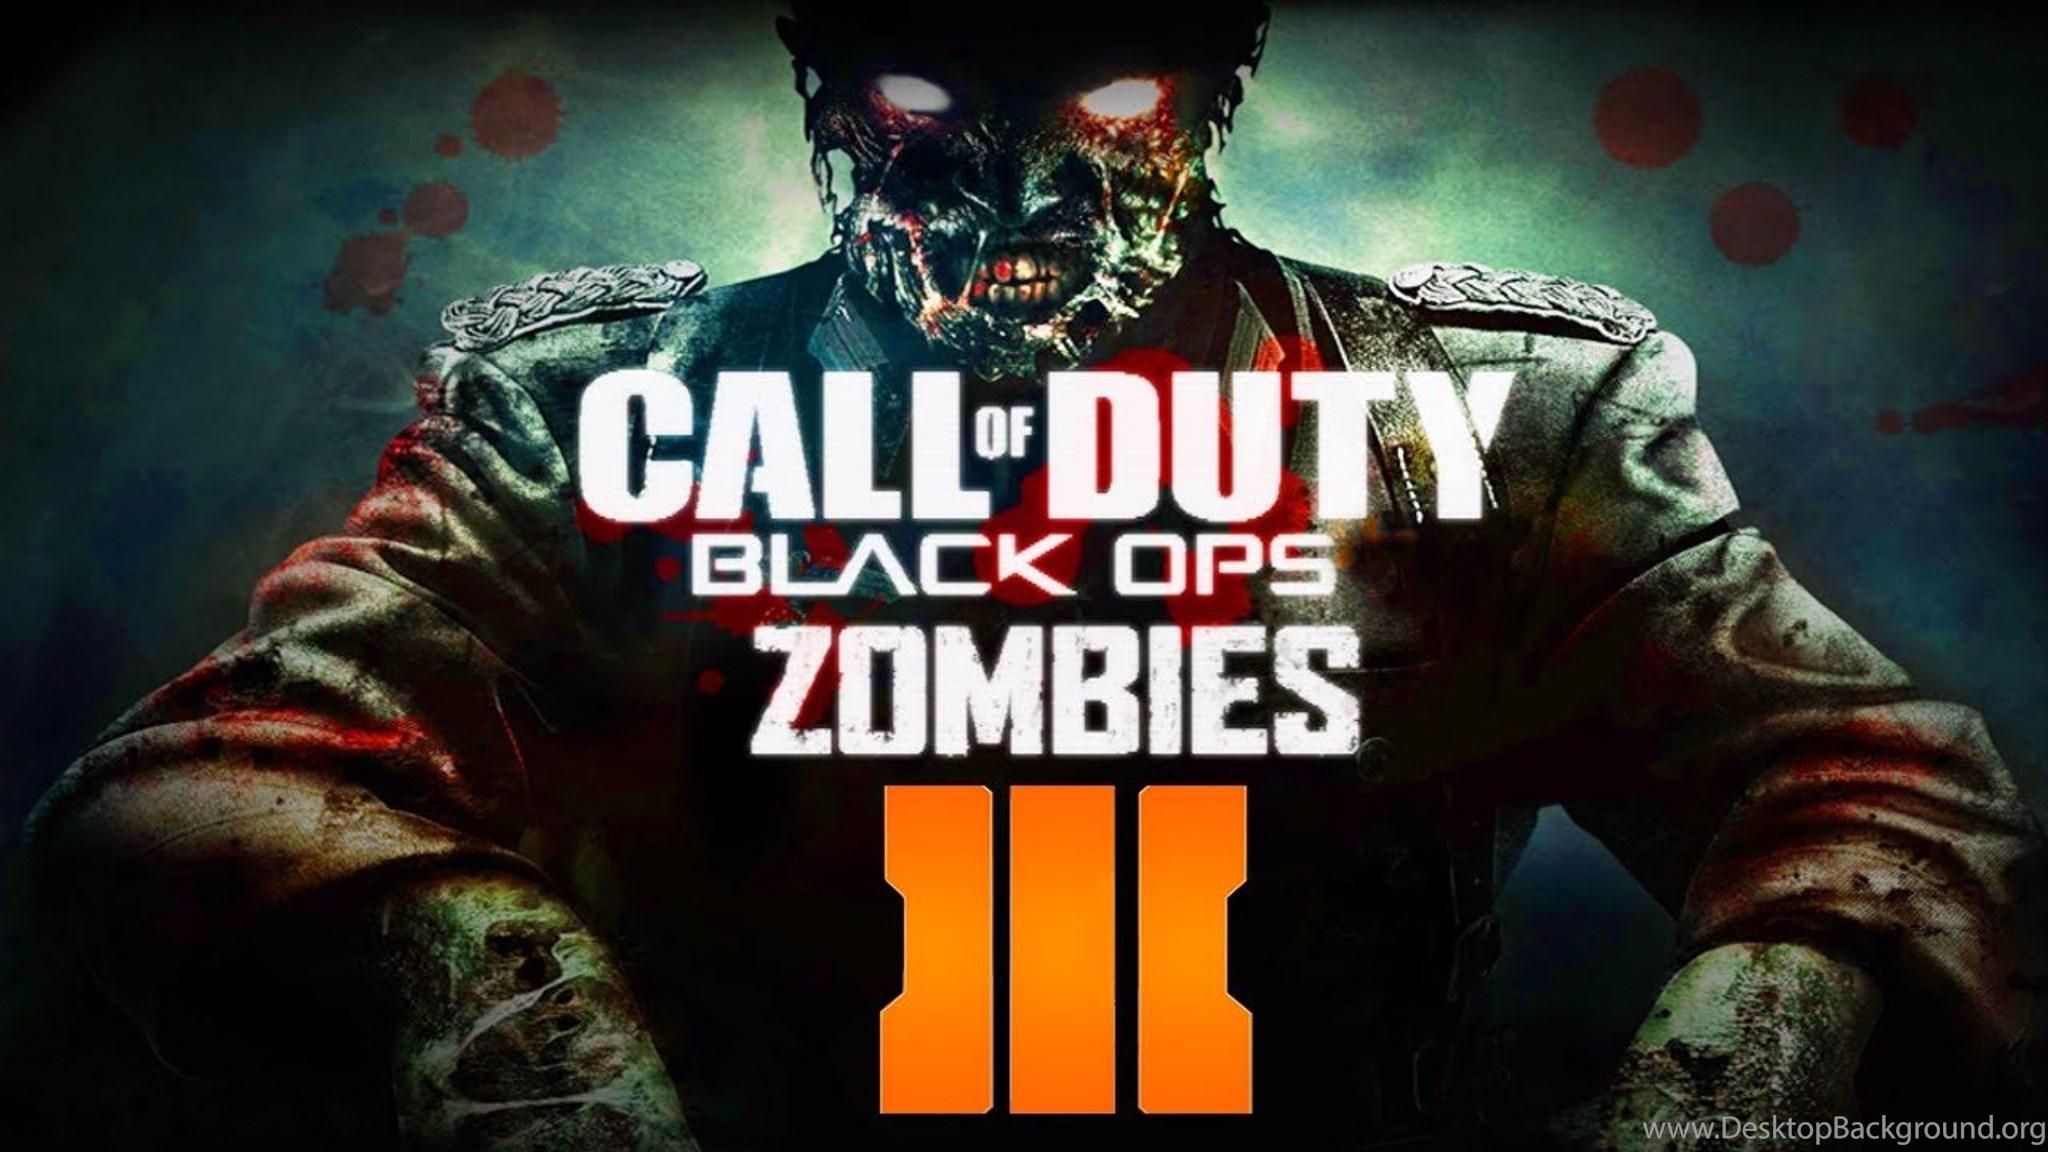 Zombies Call Of Duty Black Ops 3 4k Wallpapers Desktop Background